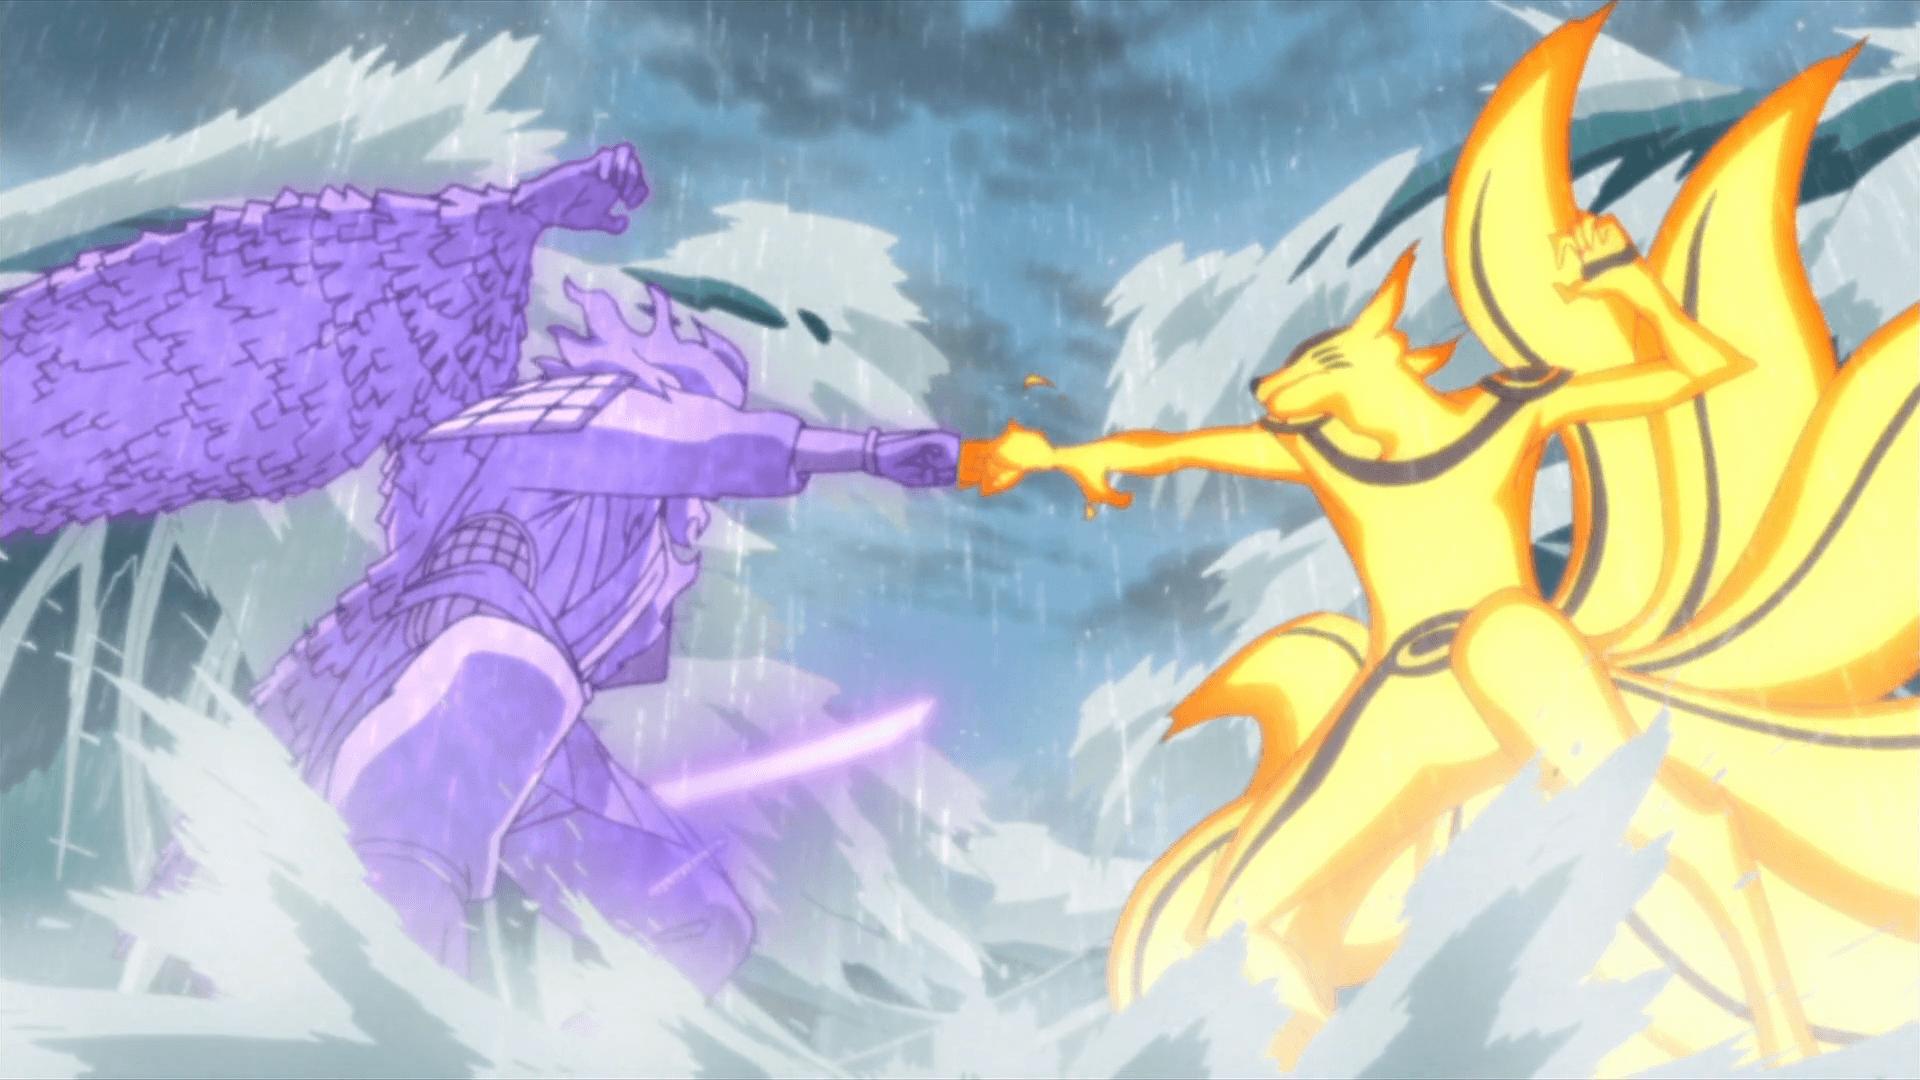 Wallpaper Naruto Vs Sasuke Final Battle Com Imagens Naruto Vs